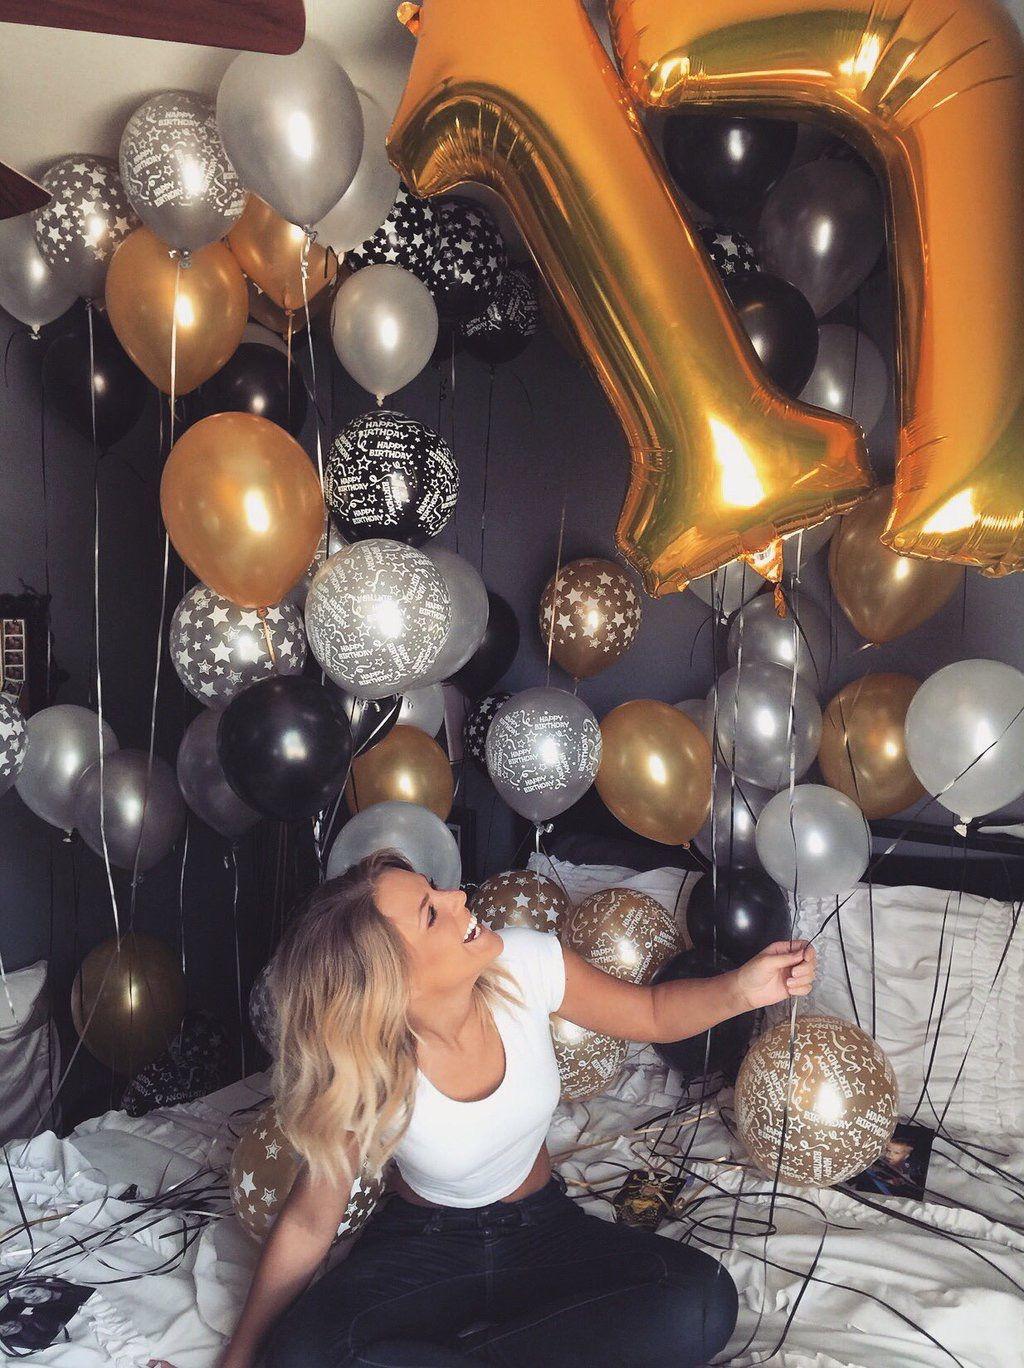 Anais bday 101718 26th Birthday Birthday Goals